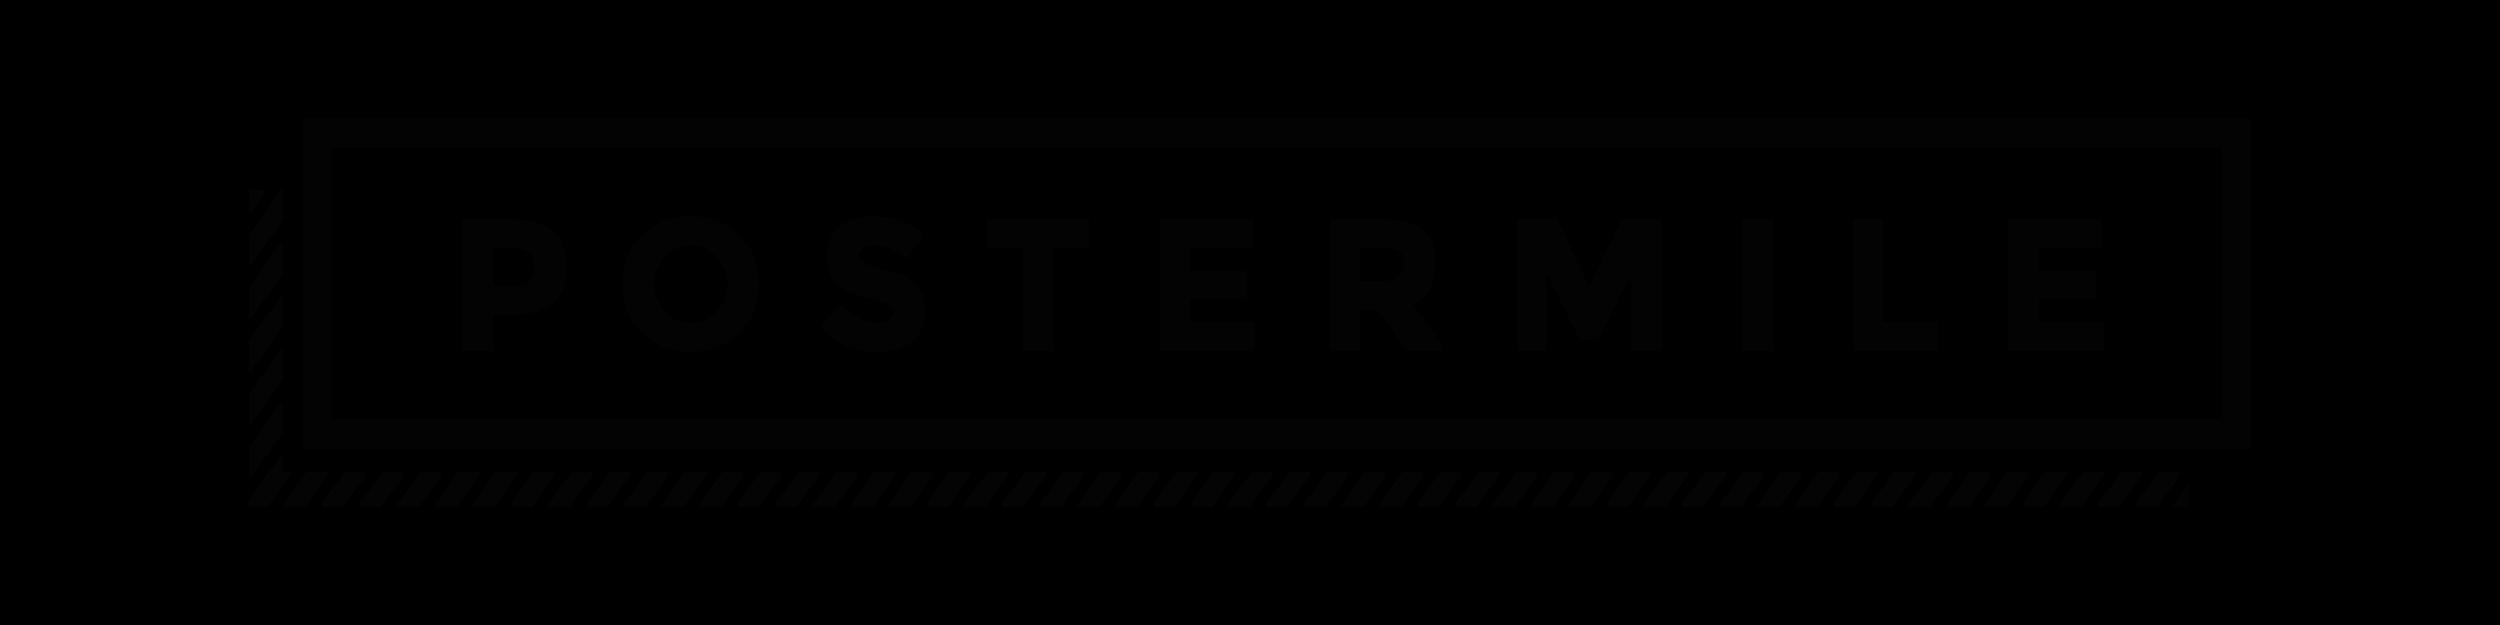 POSTERMILE_SECONDARYLOGO_BLACK_RGB-01.png